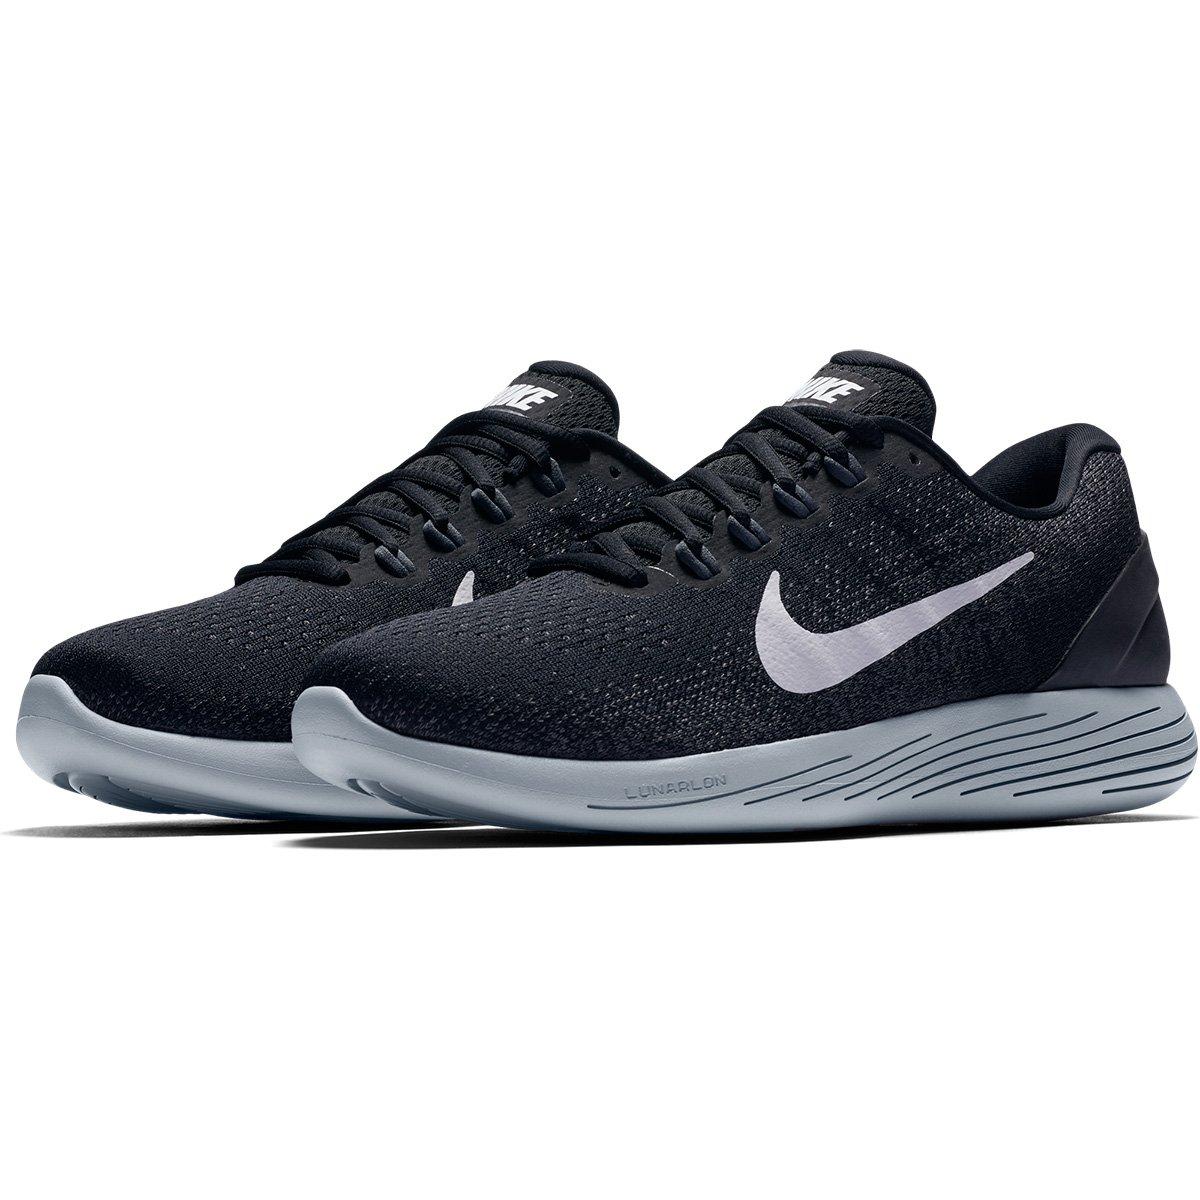 Tênis Nike Compre Lunarglide 9 Masculino Compre Nike Agora Netsapatos 1d351f